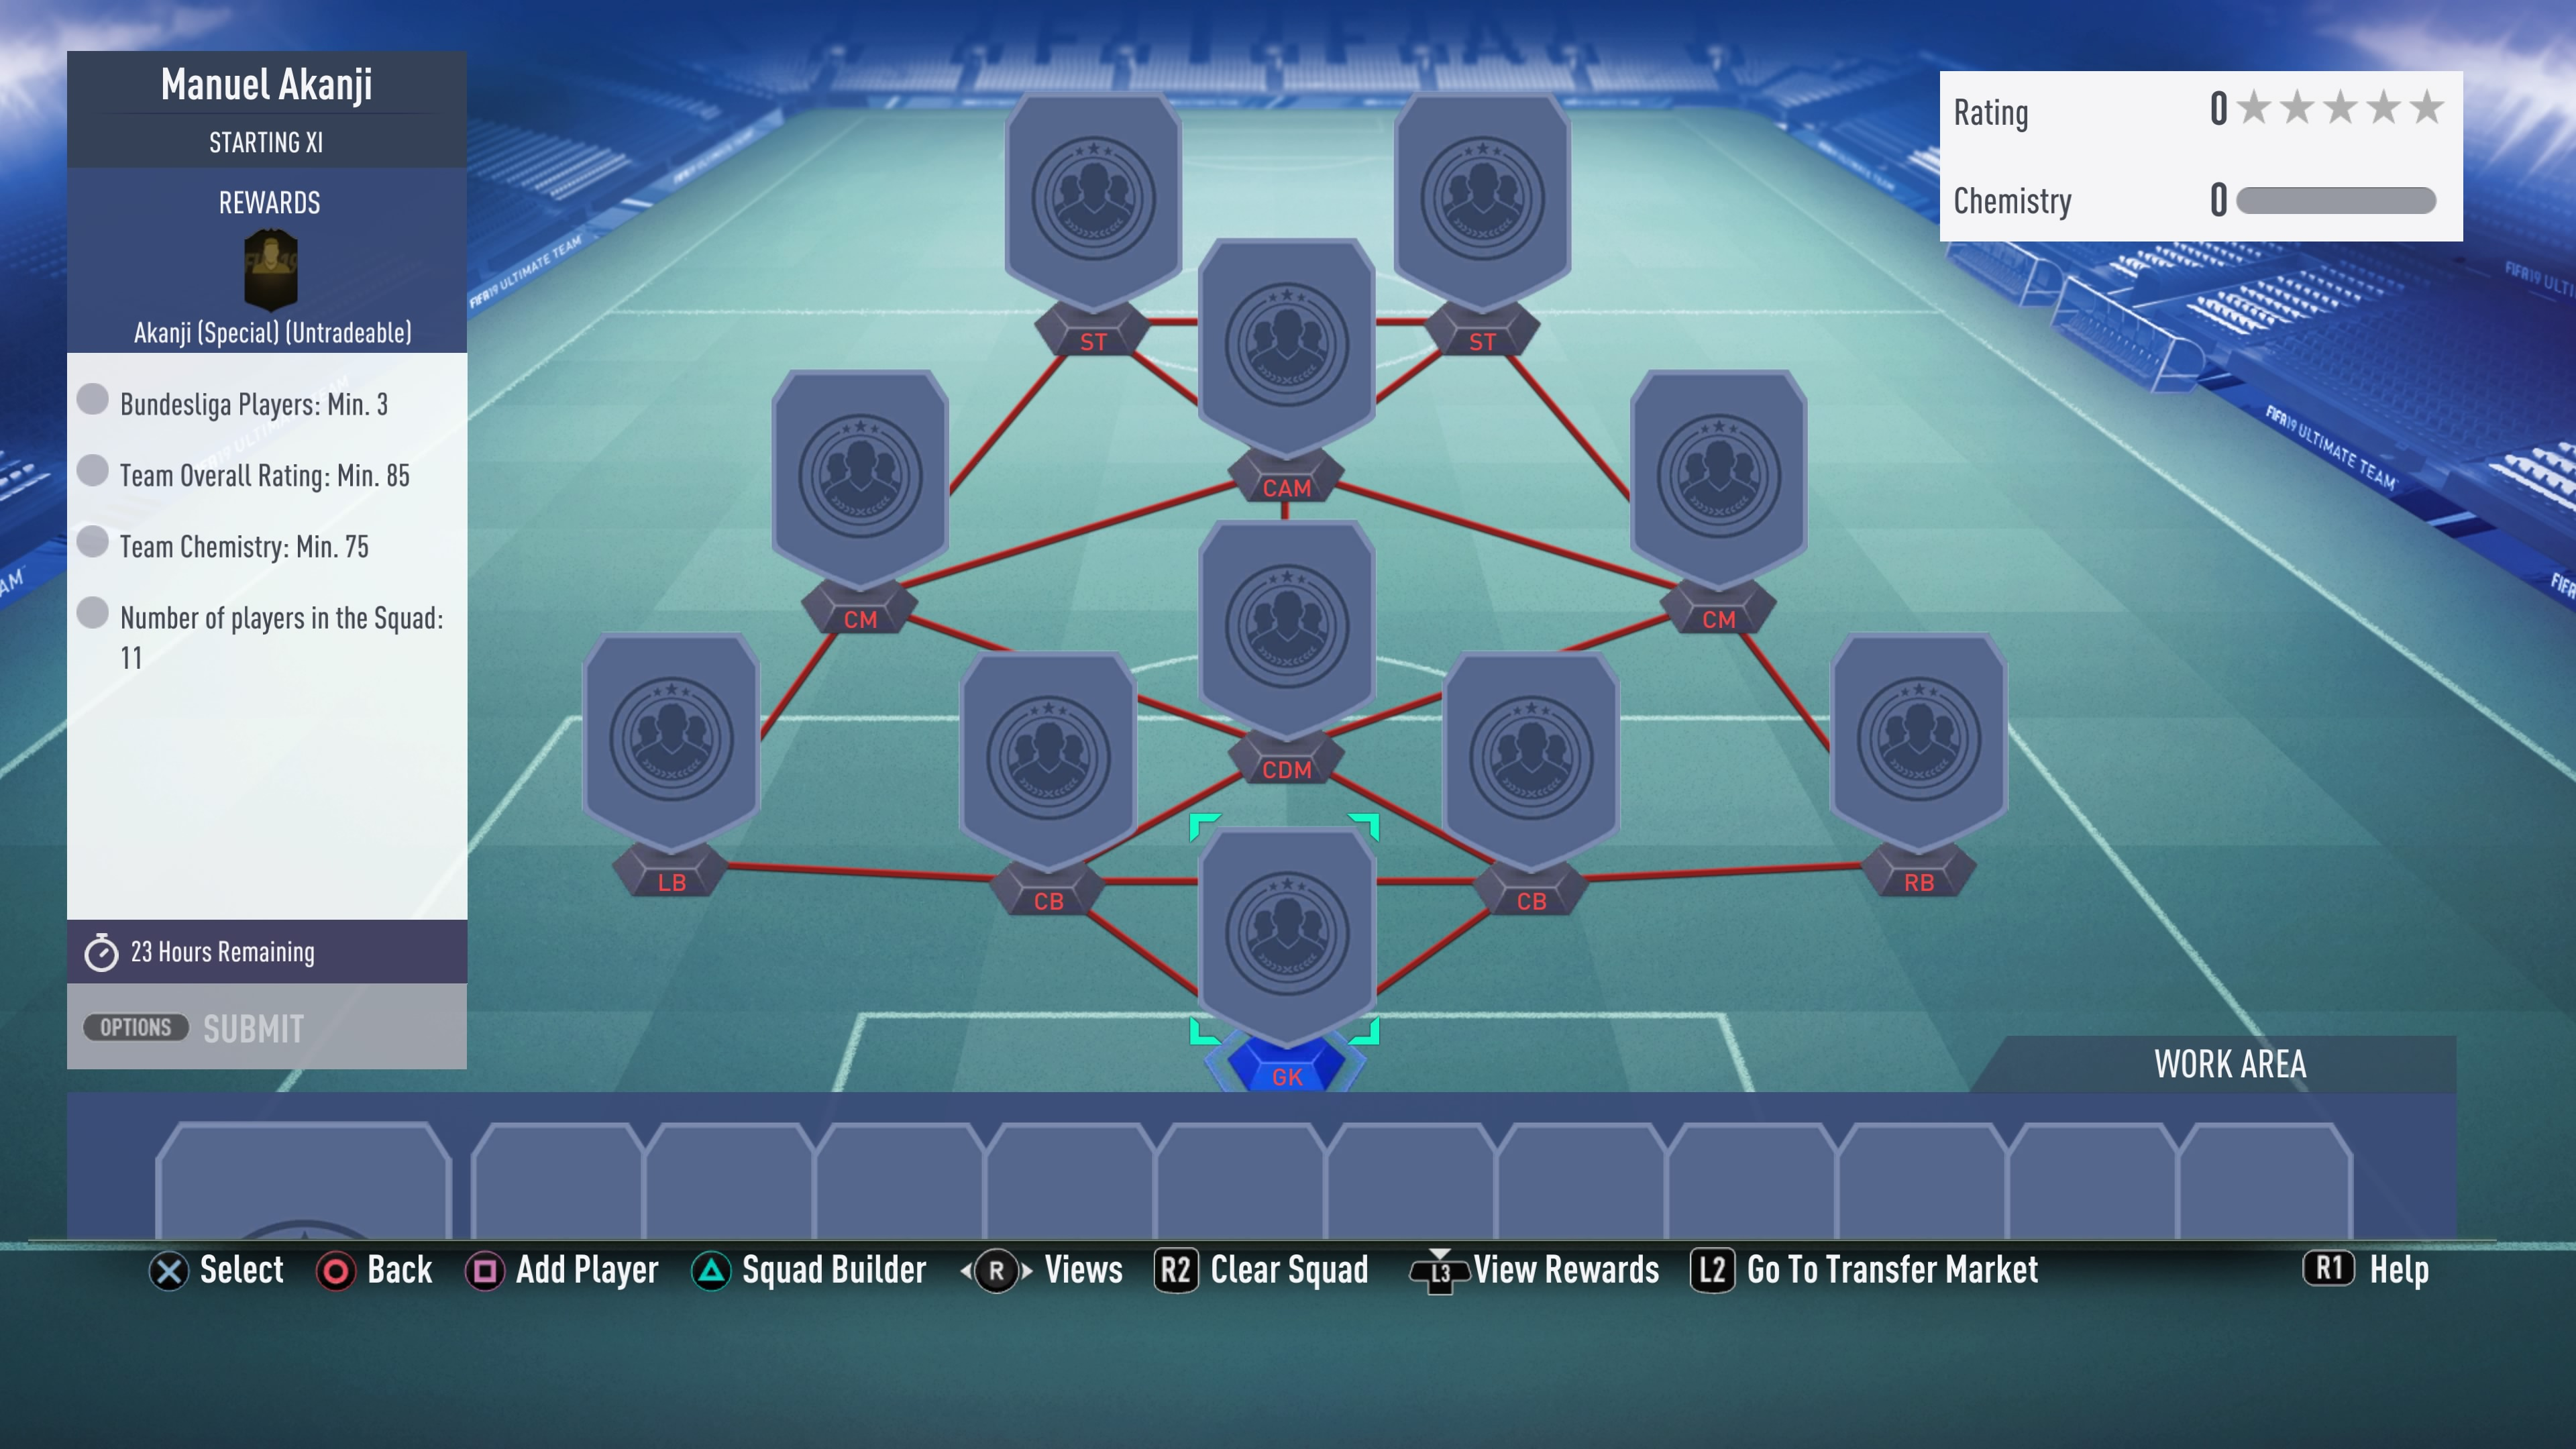 FIFA 19 futmas, akanji, sbc